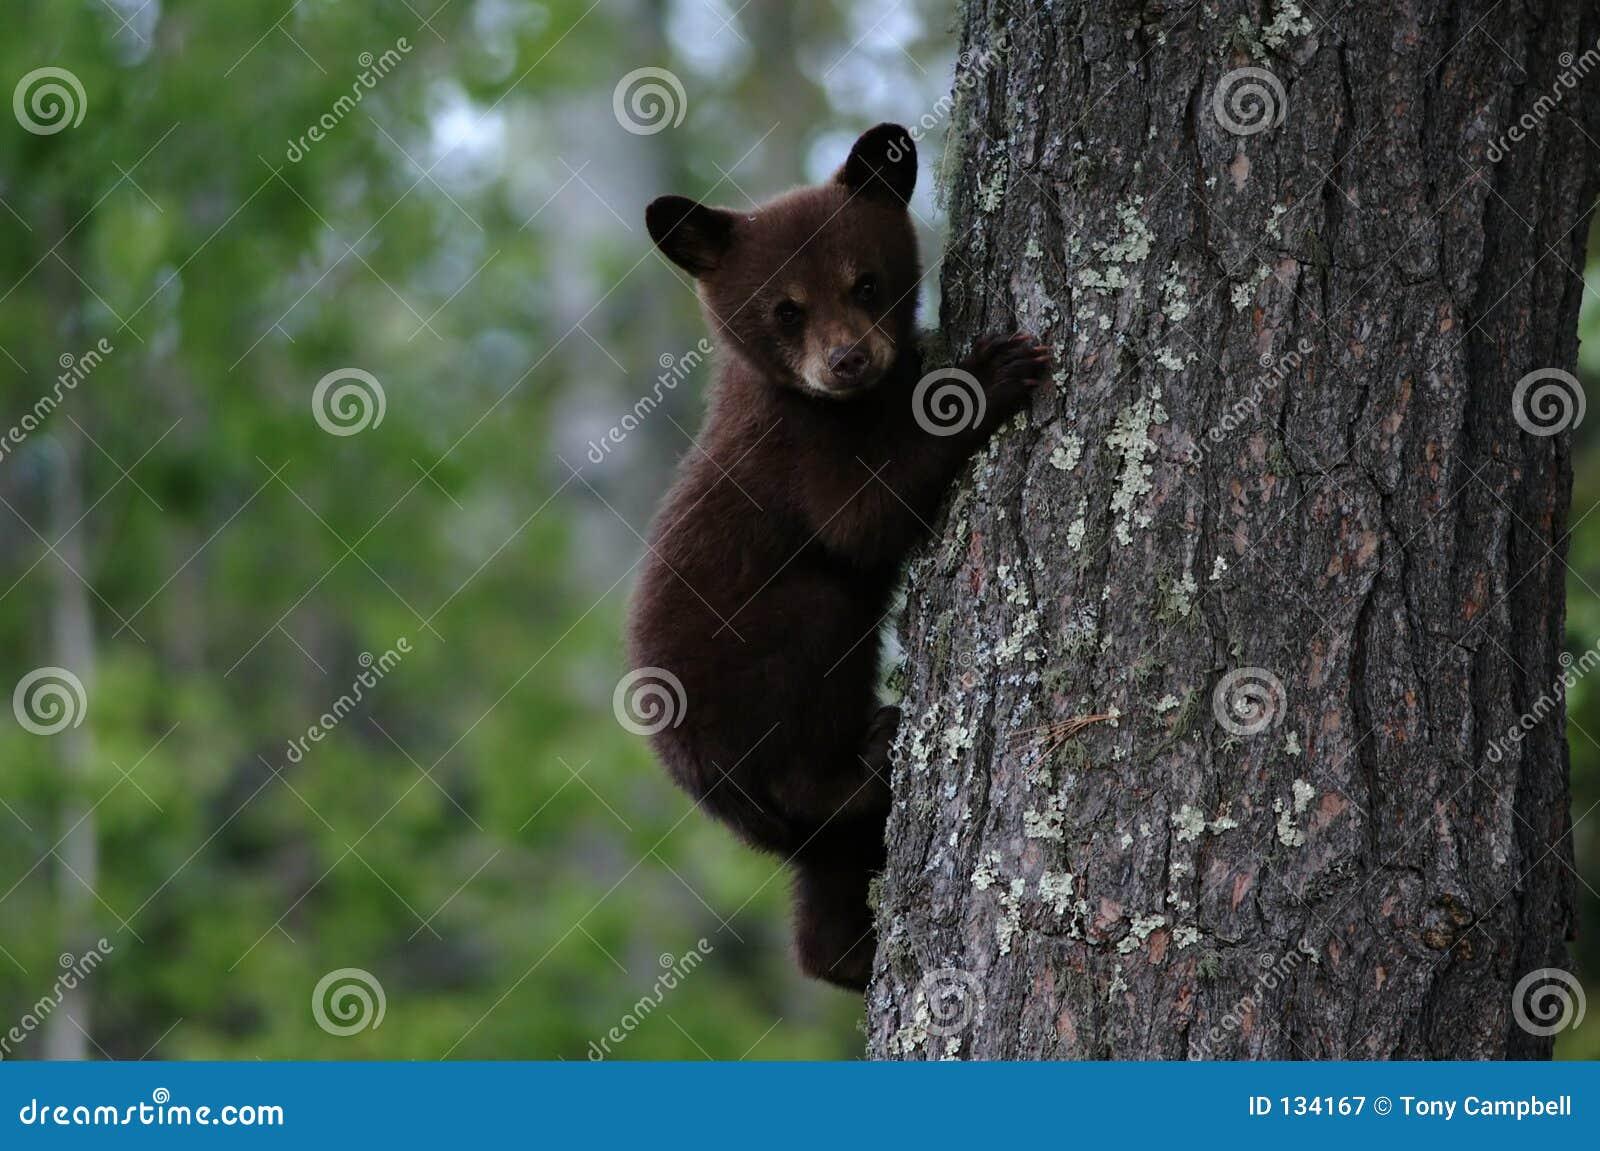 Black Bear Cub Tree Royalty Free Stock Photography - Image: 134167